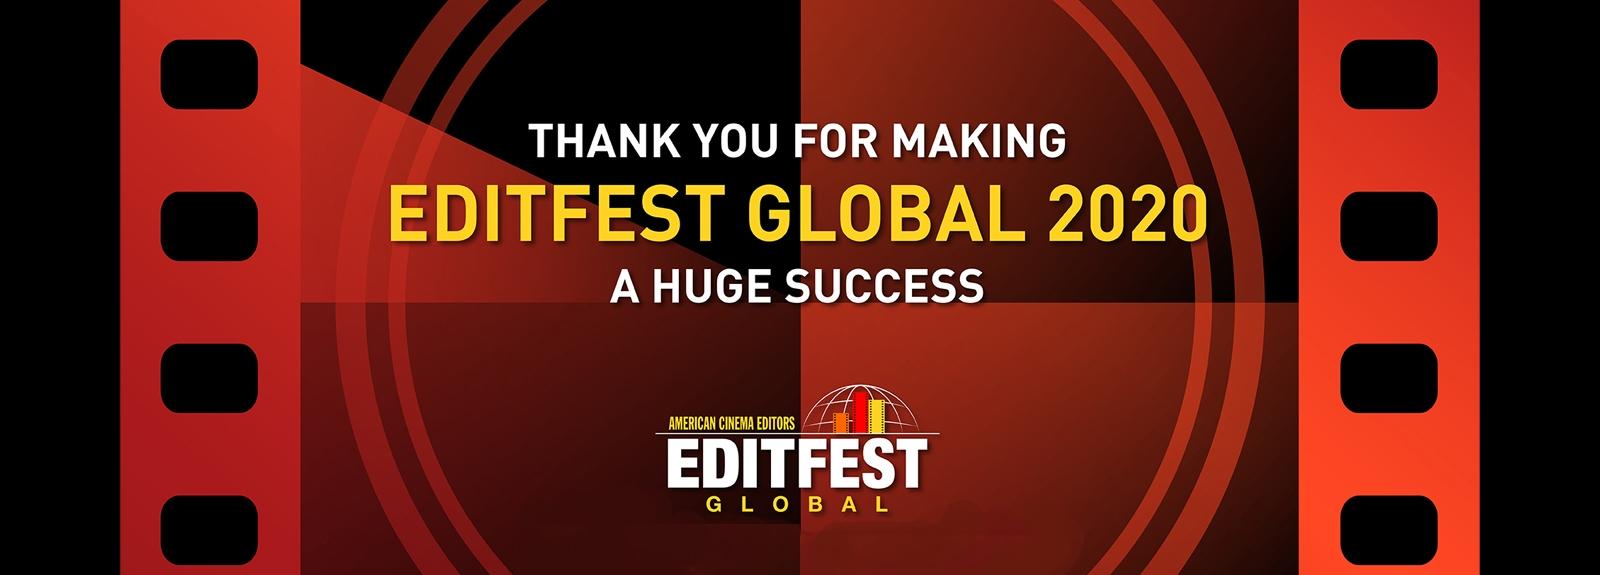 EditFest Global